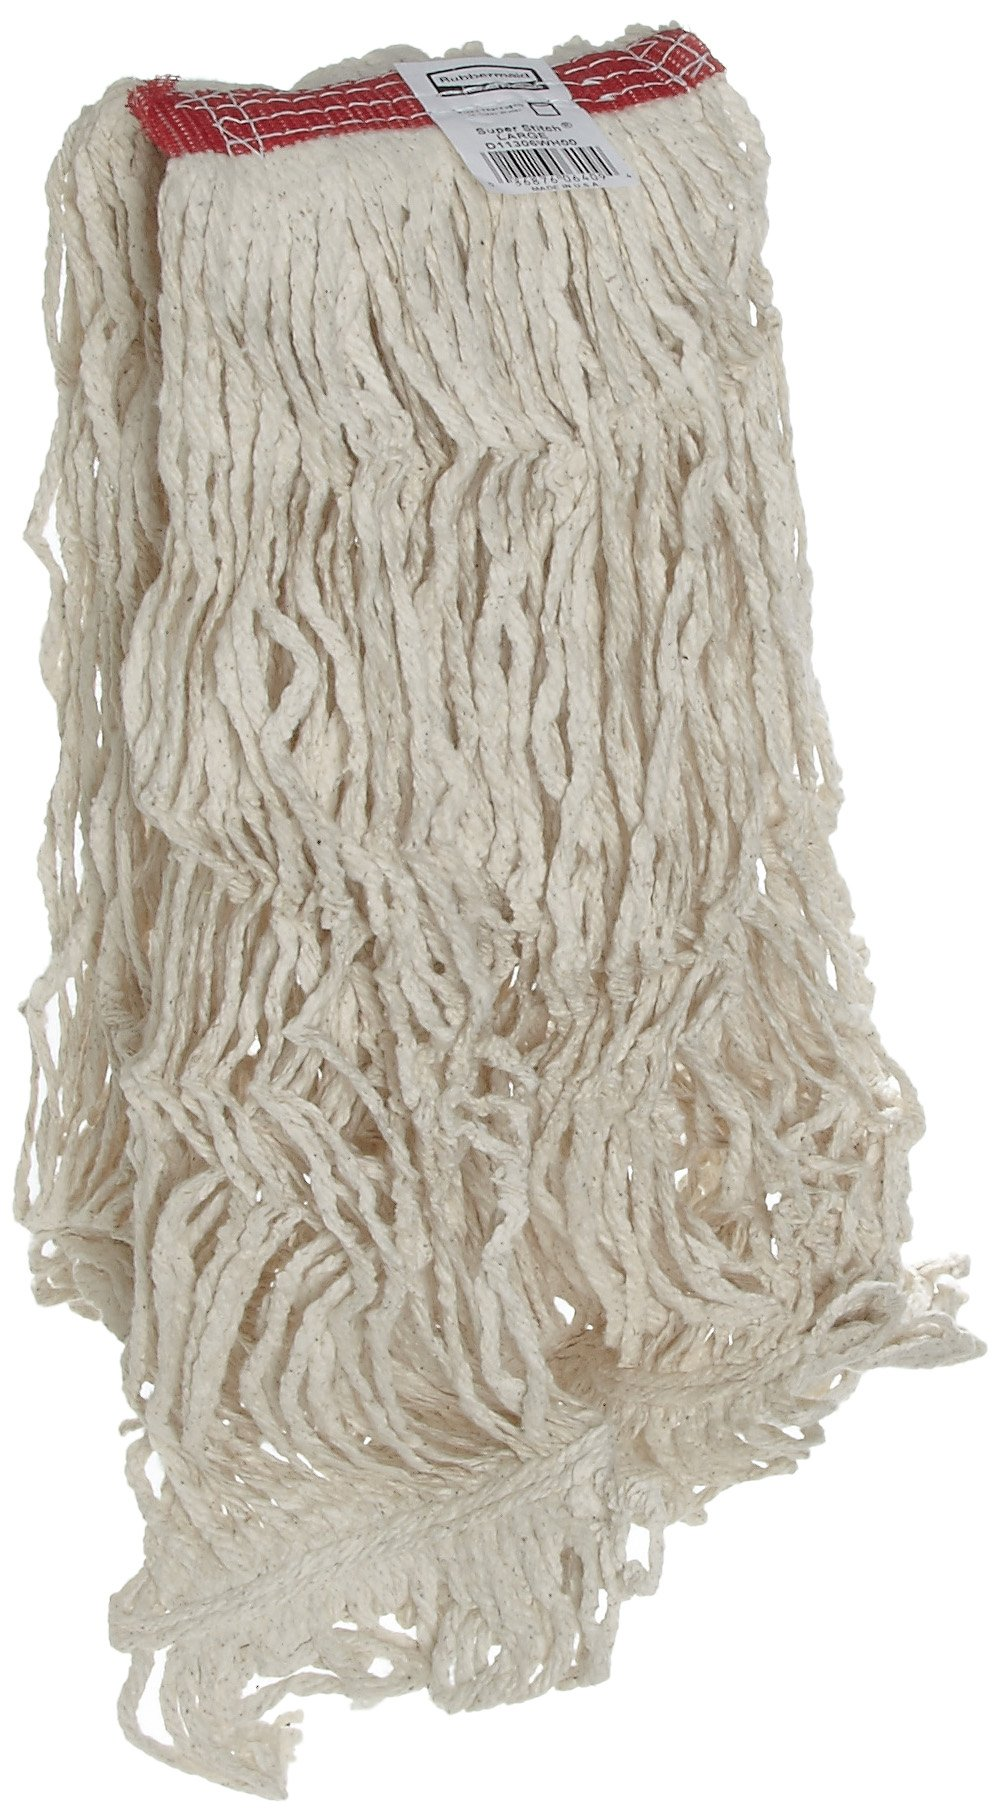 Rubbermaid Commercial Super Stitch Cotton Mop, Large, White, FGD11306WH00